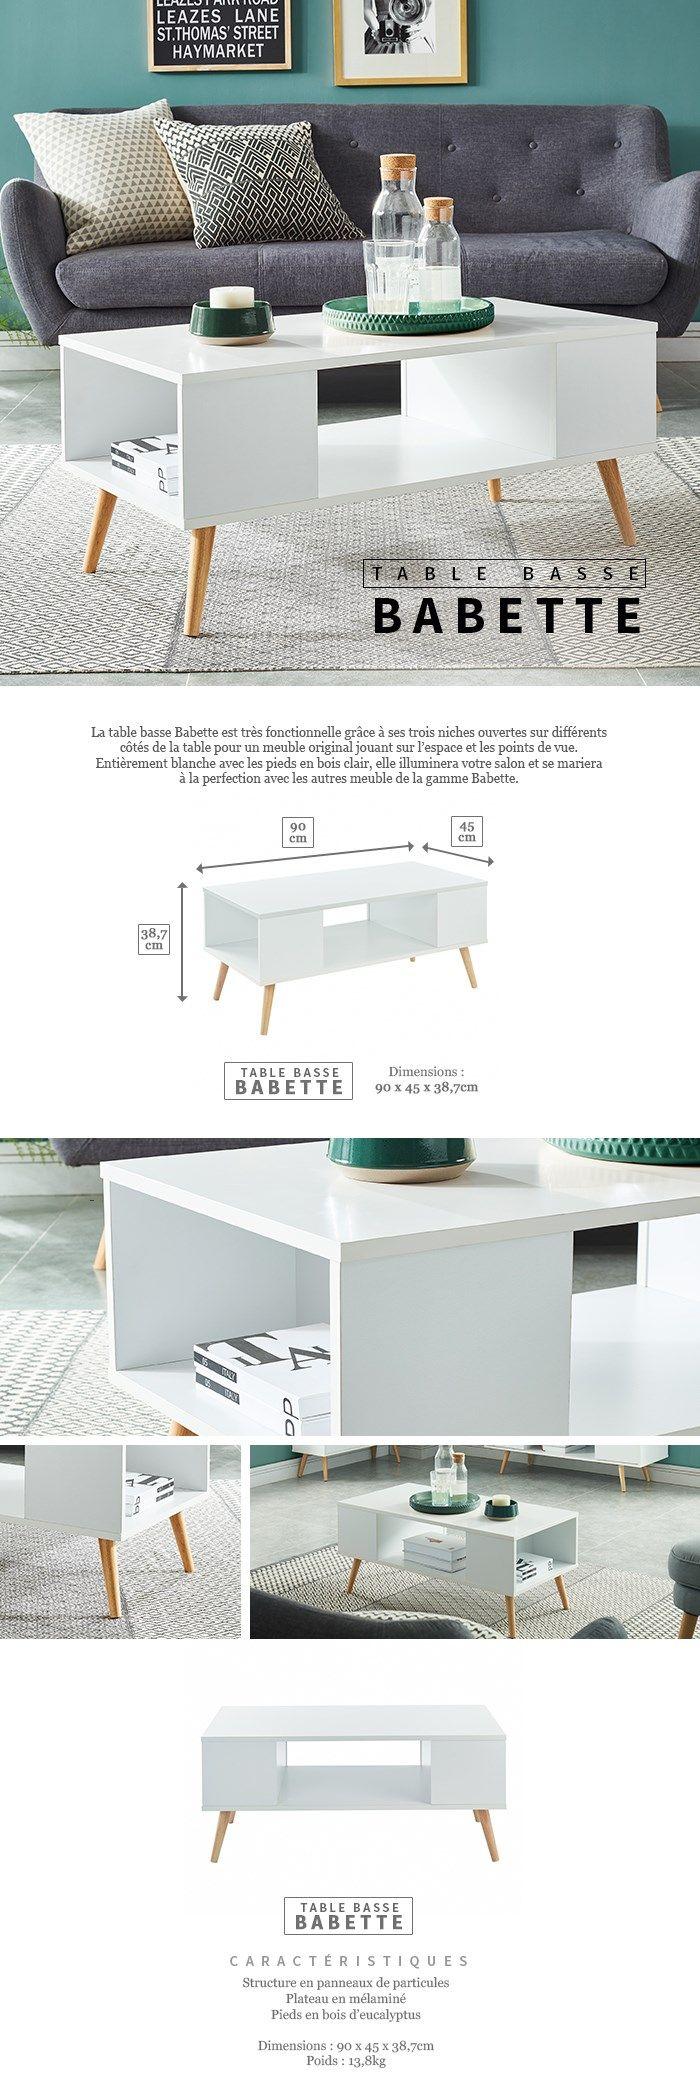 Basse Décor Bois Babette Table En Scandinave BlancPieds N80OvmnwyP